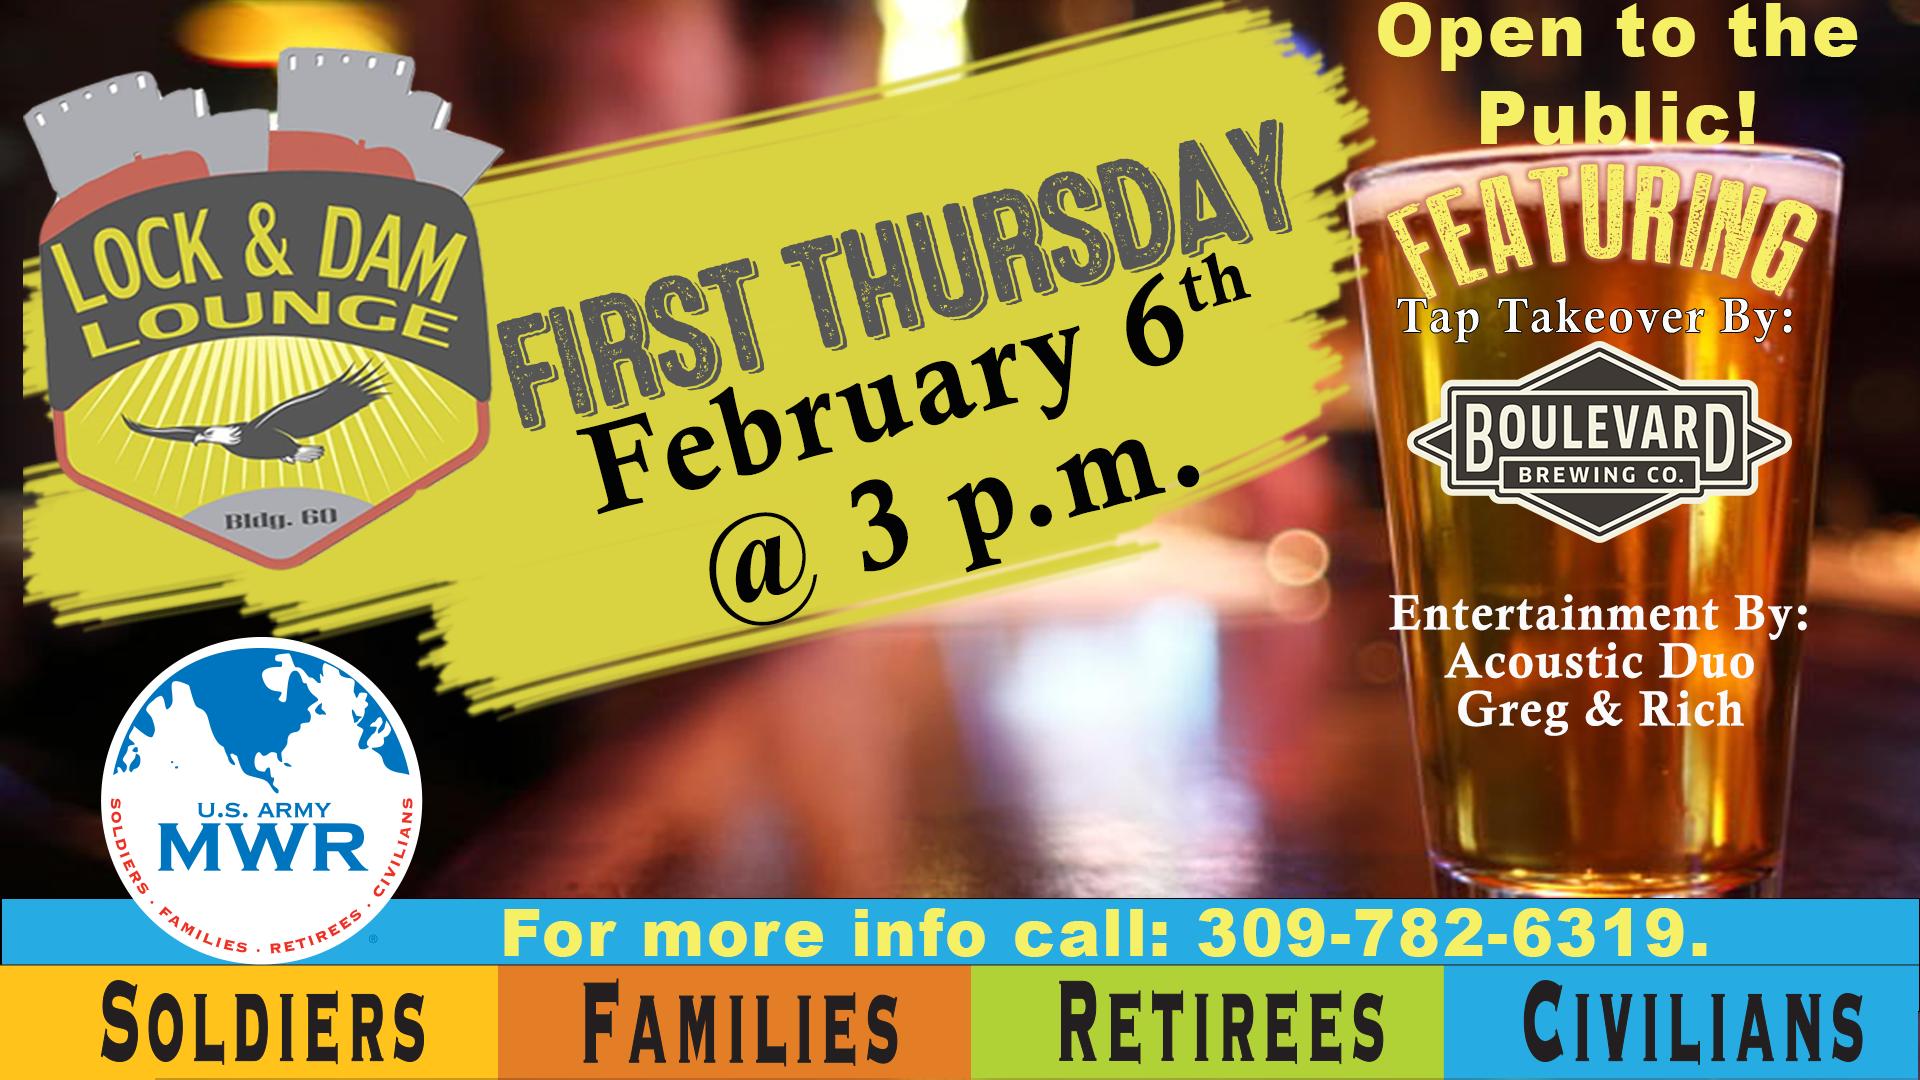 First Thursday Social